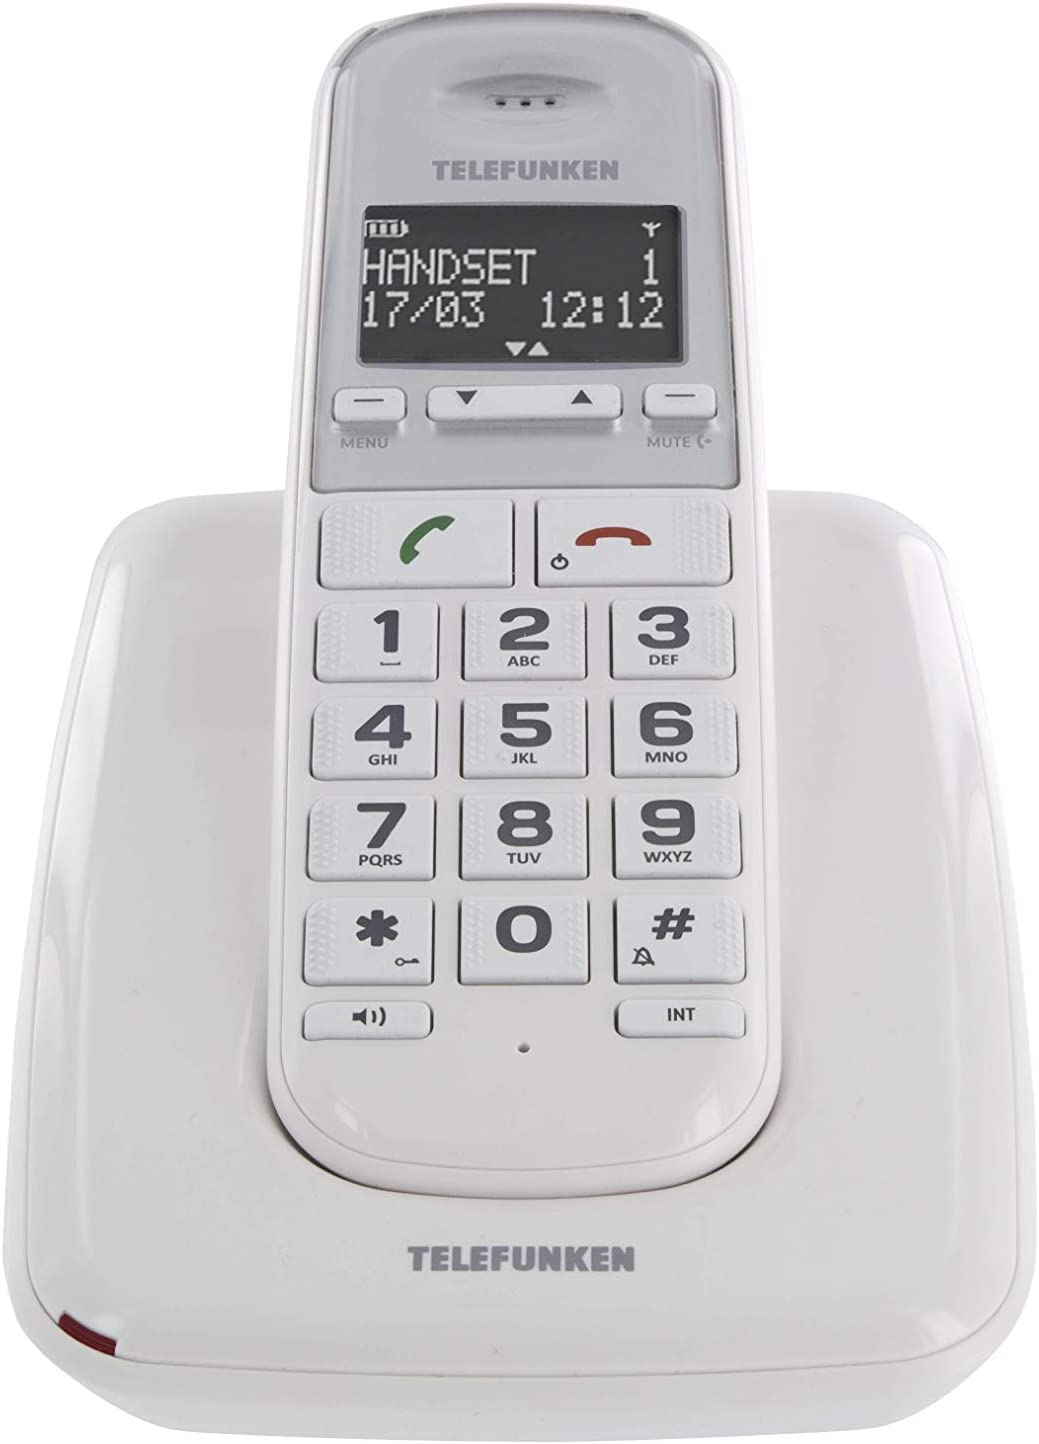 Telefunken TD 301 PILLOW - Teléfono Inalámbrico Td 301 Pillow: Amazon.es: Electrónica